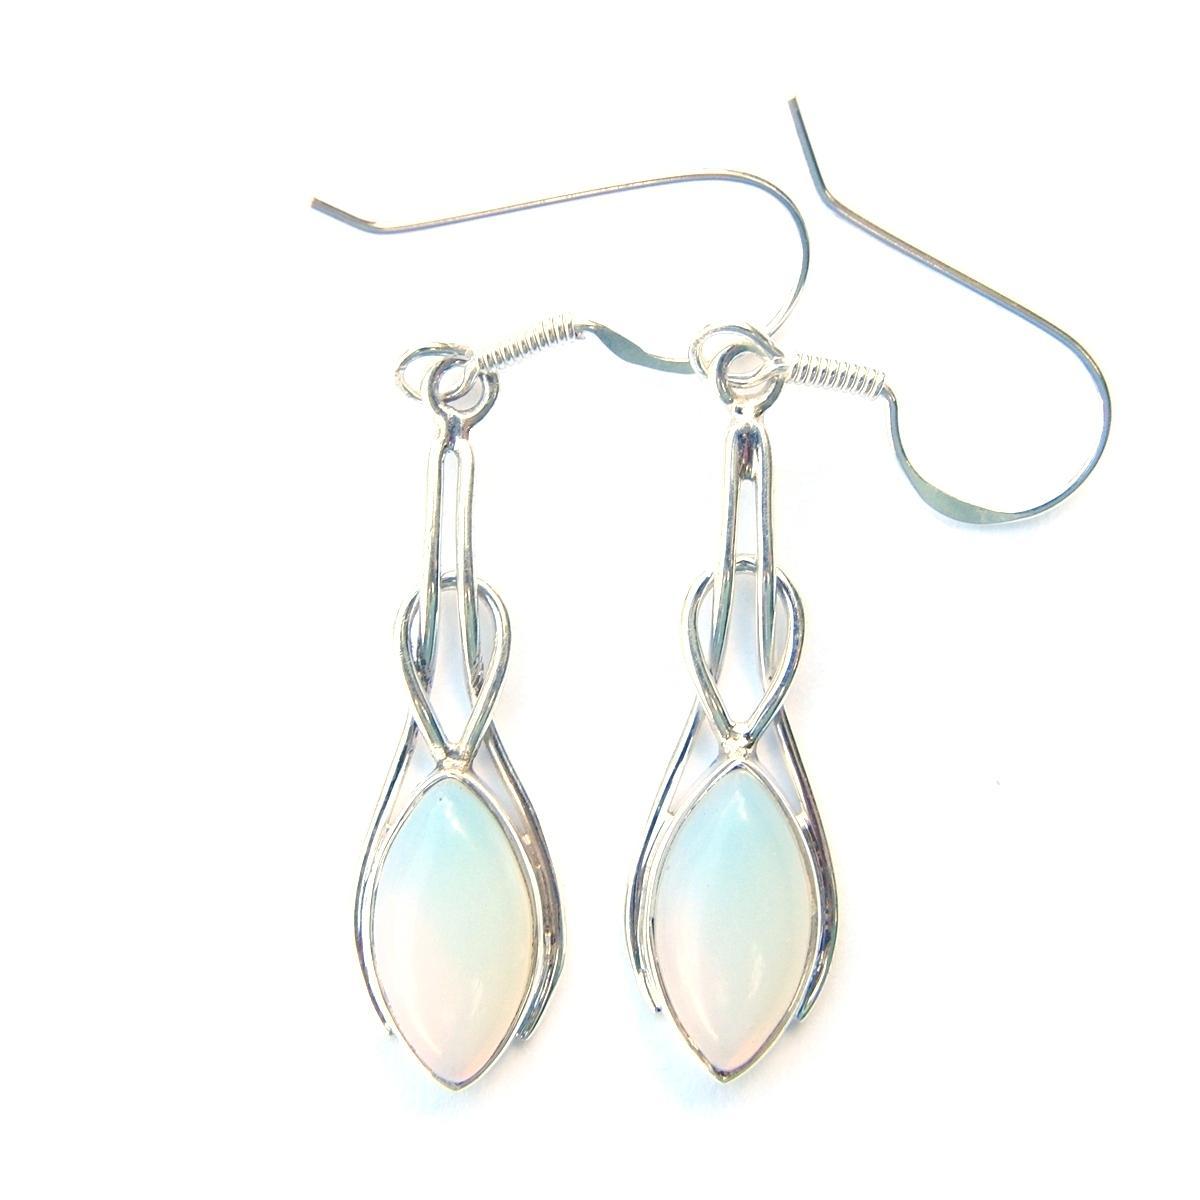 Opalite Marquise Knot Earrings